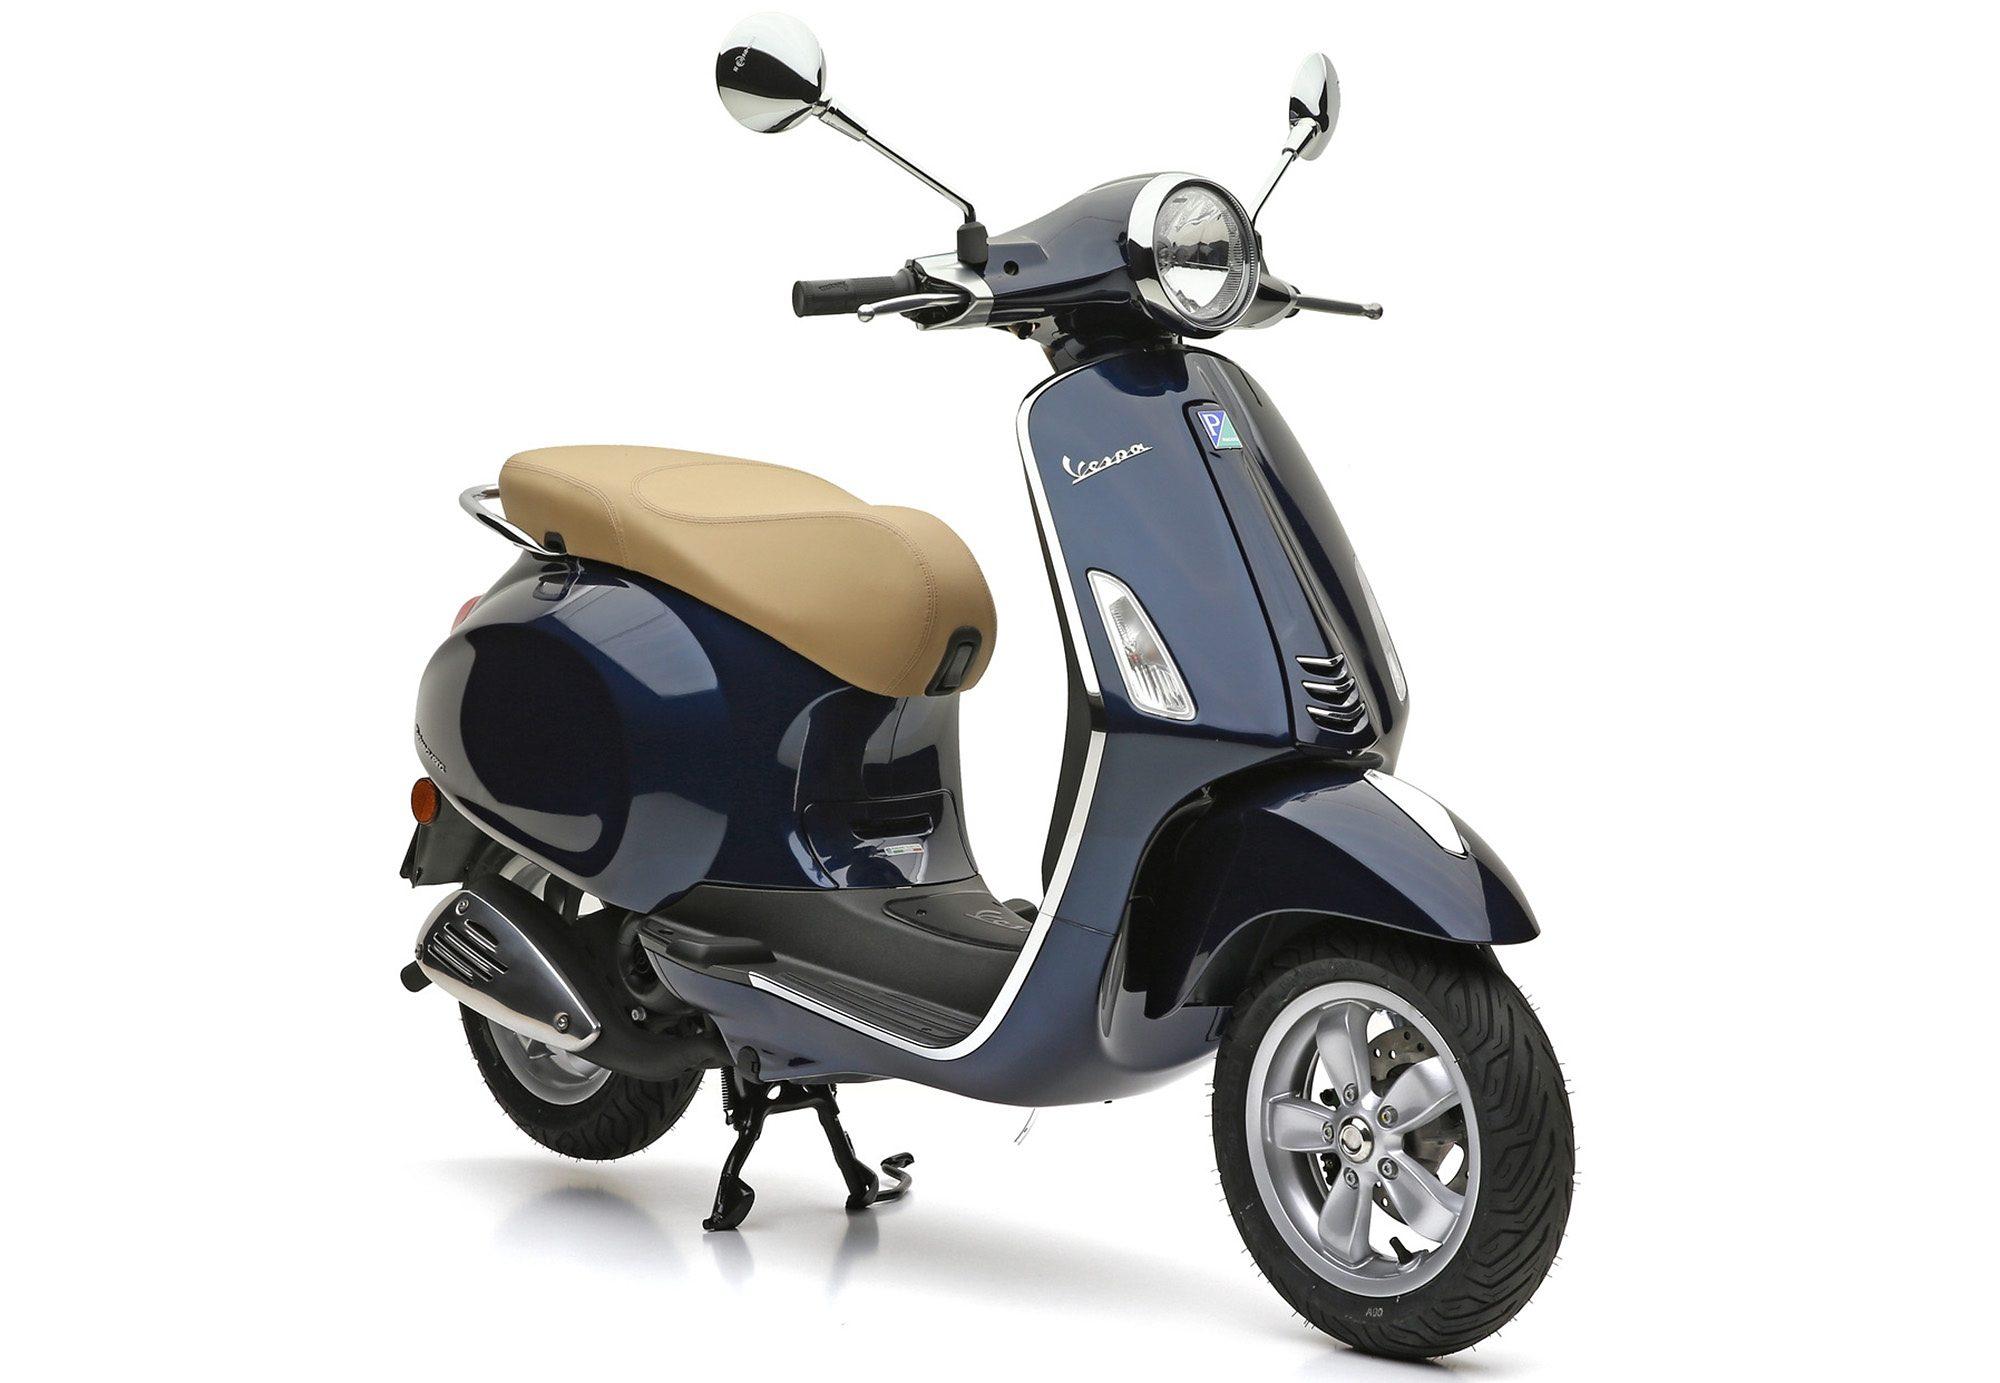 Motorroller, 49 ccm, 4,35 PS, 45 km/h, dunkelblau, »Primavera«, Vespa